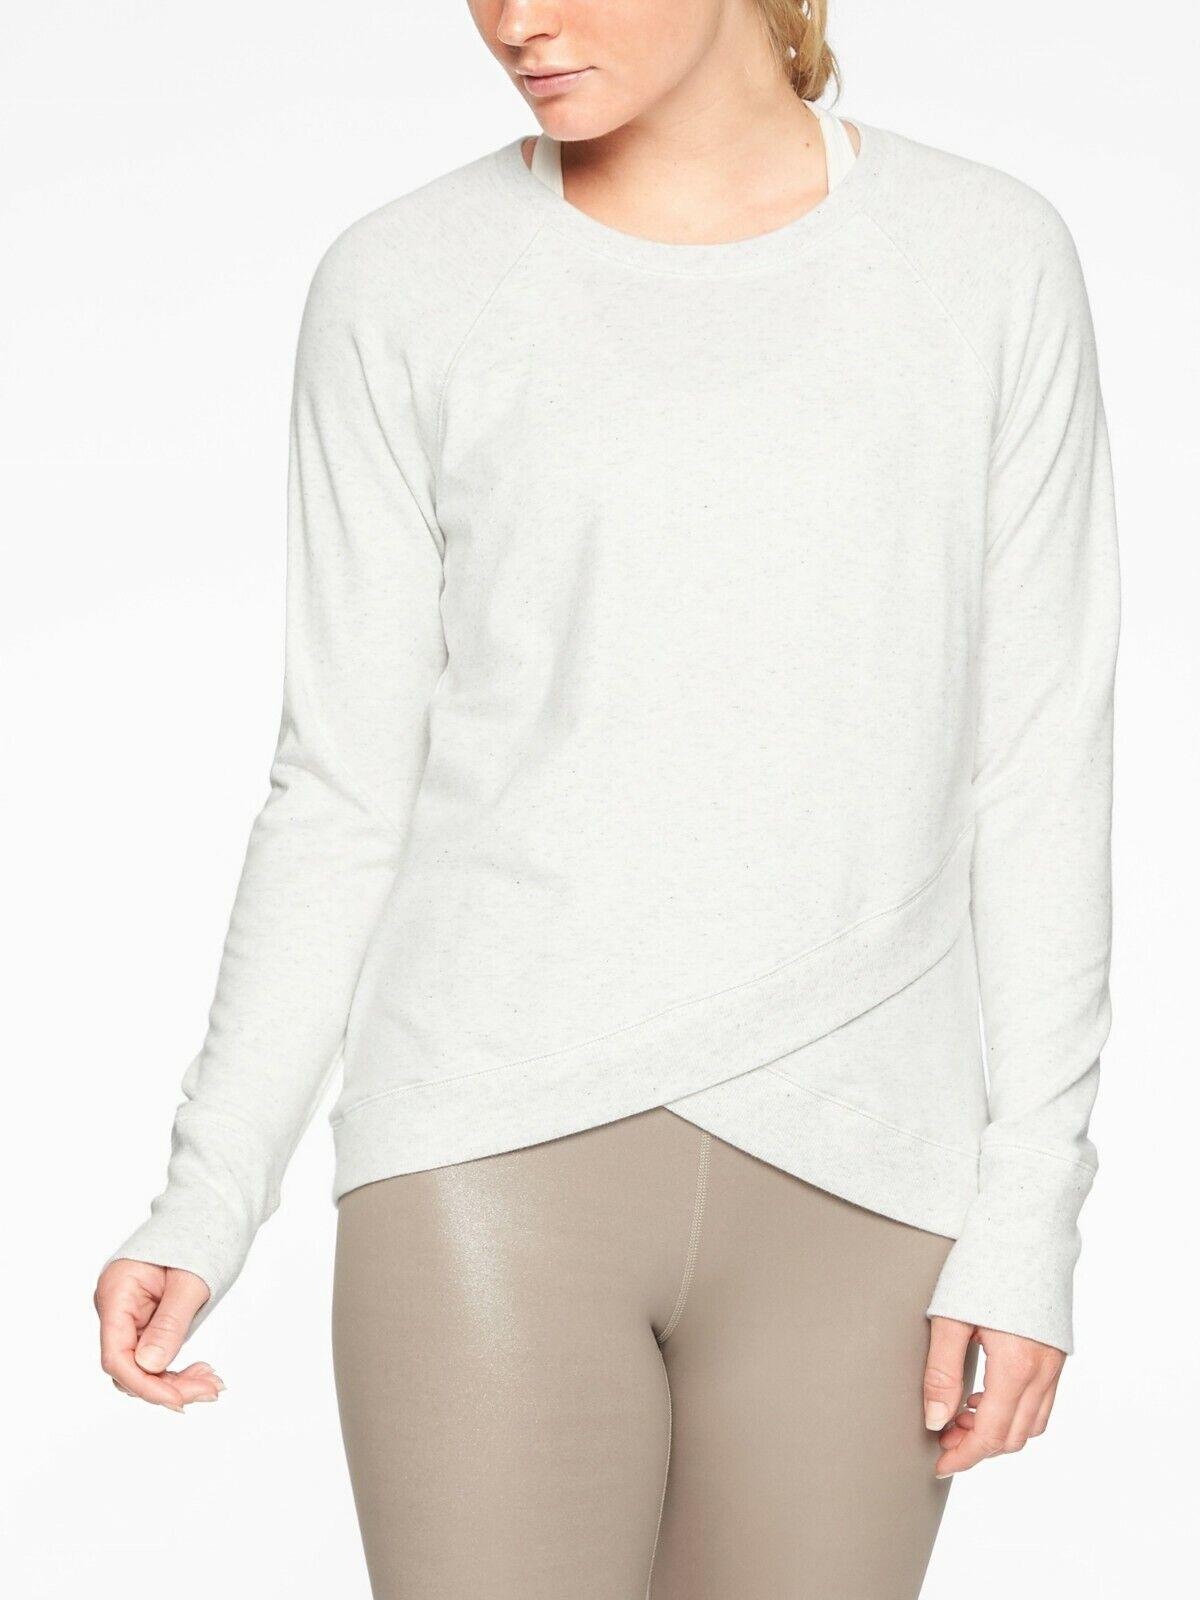 Athleta Criss Cross Sweatshirt, Sea Salt Heather Nep Größe ST S T   N0225